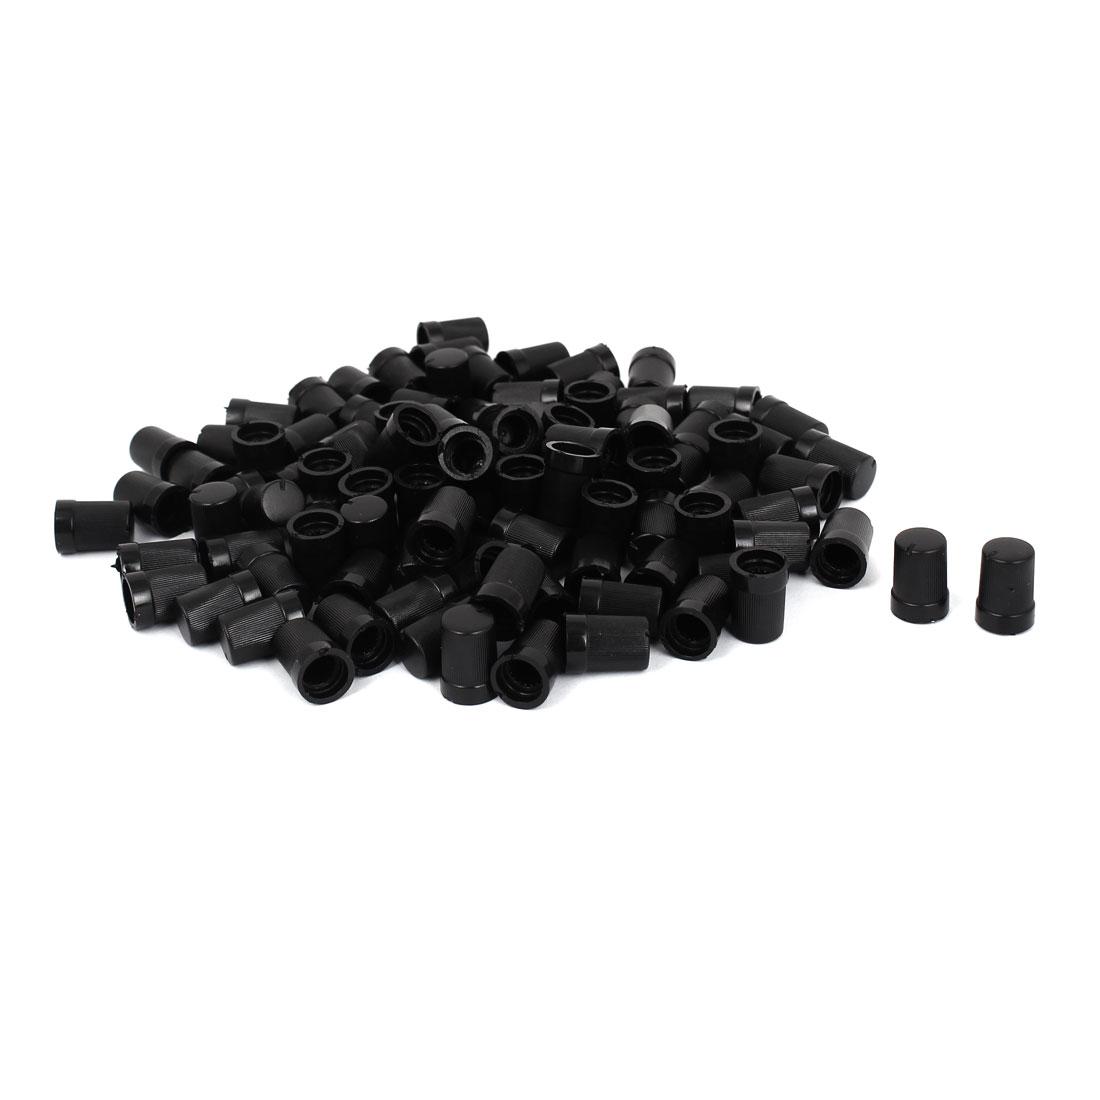 100pcs Black Round Shape Potentiometer Pot Control Knob for 7mm Dia Shaft